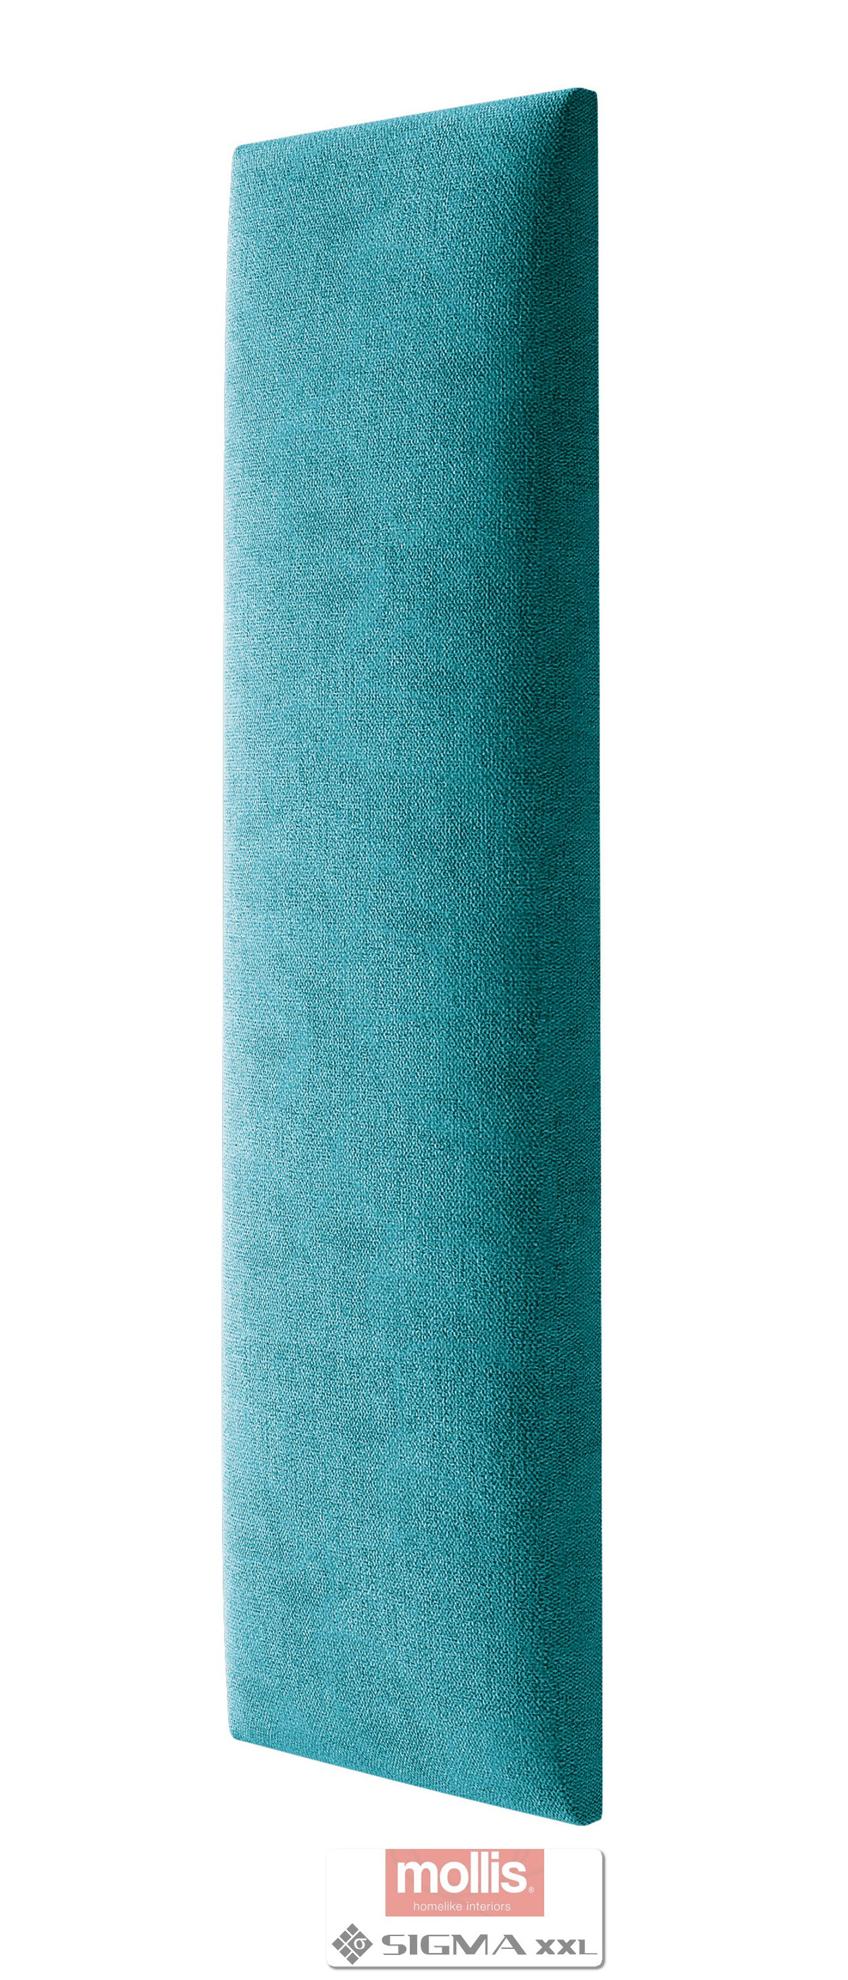 Imagine Mollis Basic 03 Turquoise (Dreptunghi- 15x60 cm)